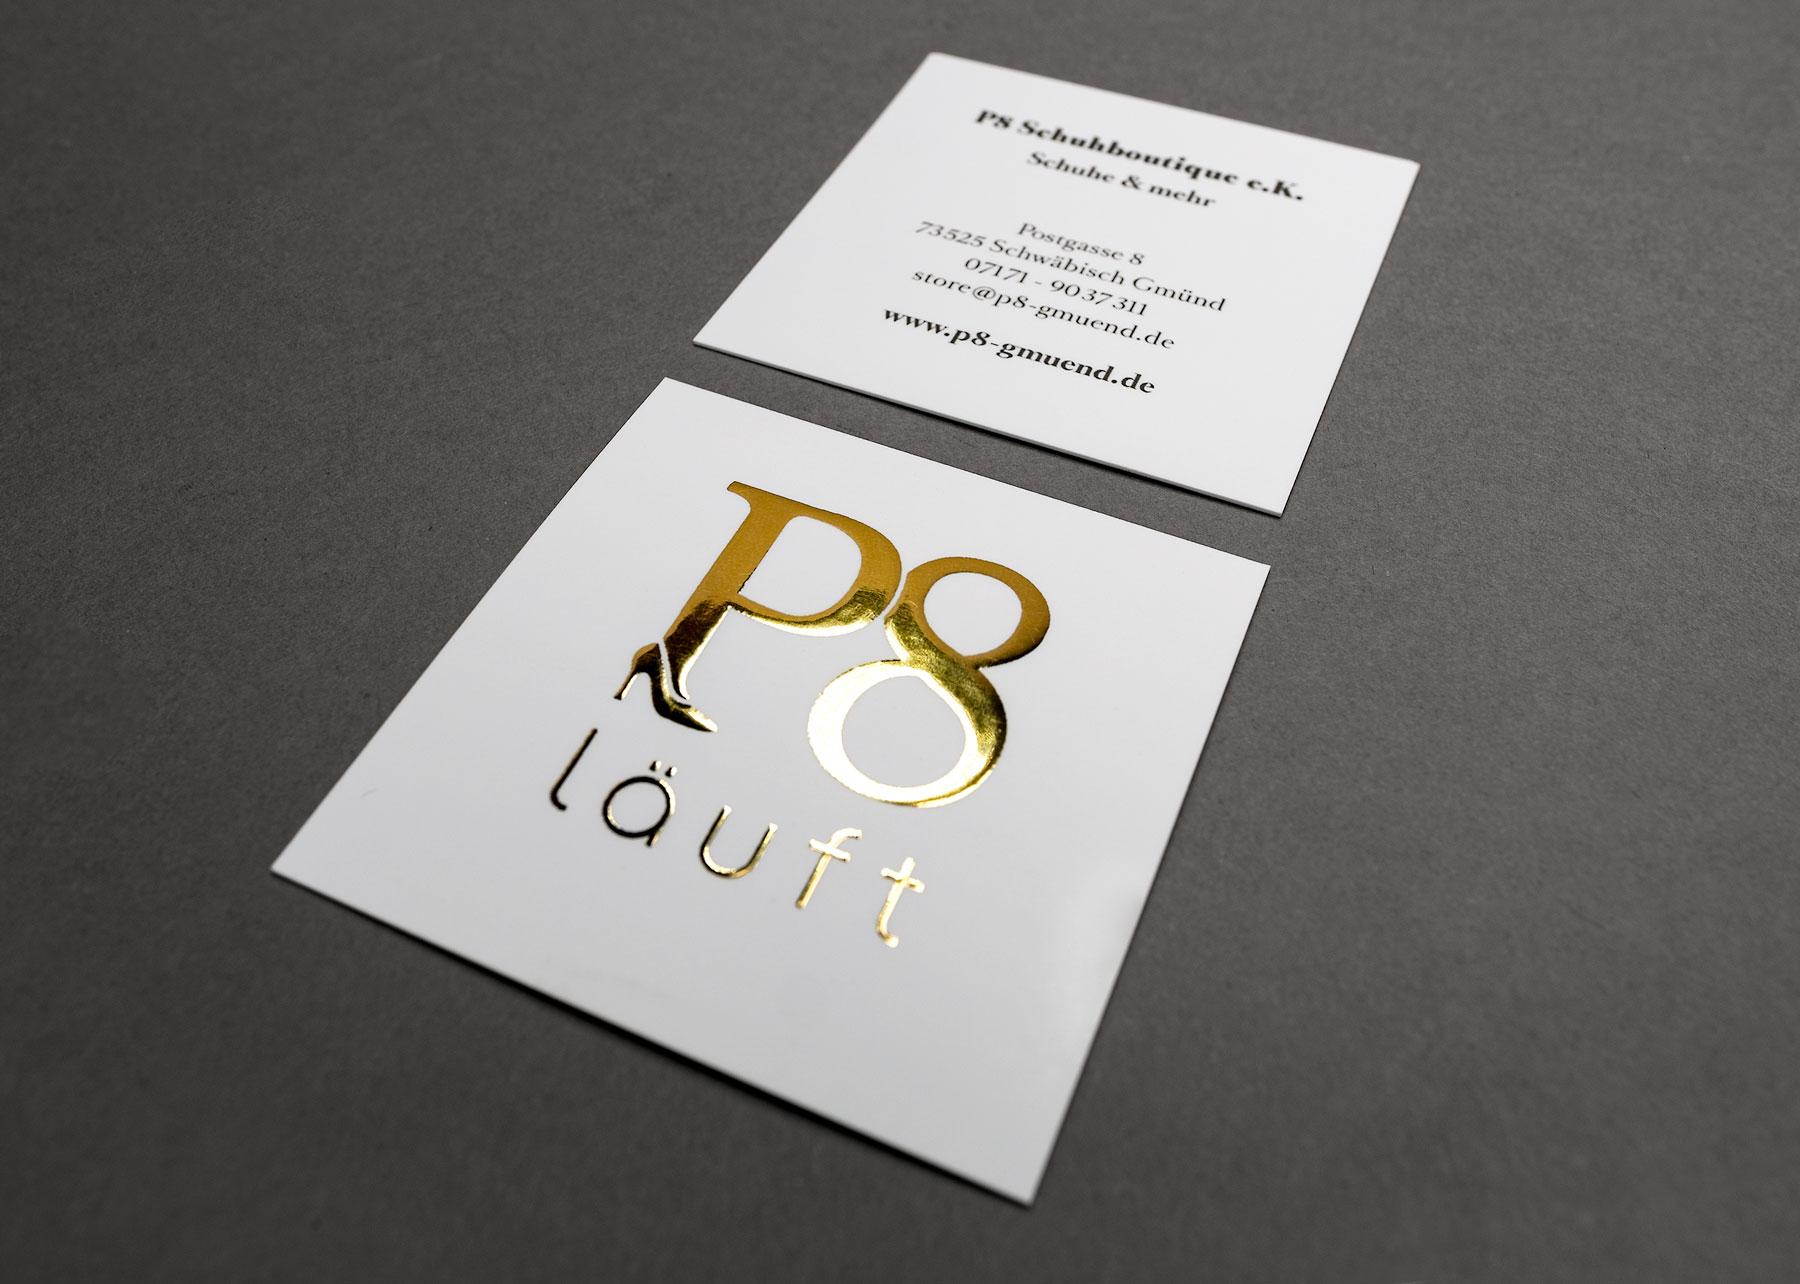 P8 Vistenkarte, VS Heißfolienprägung Gold + Rückseite 4C